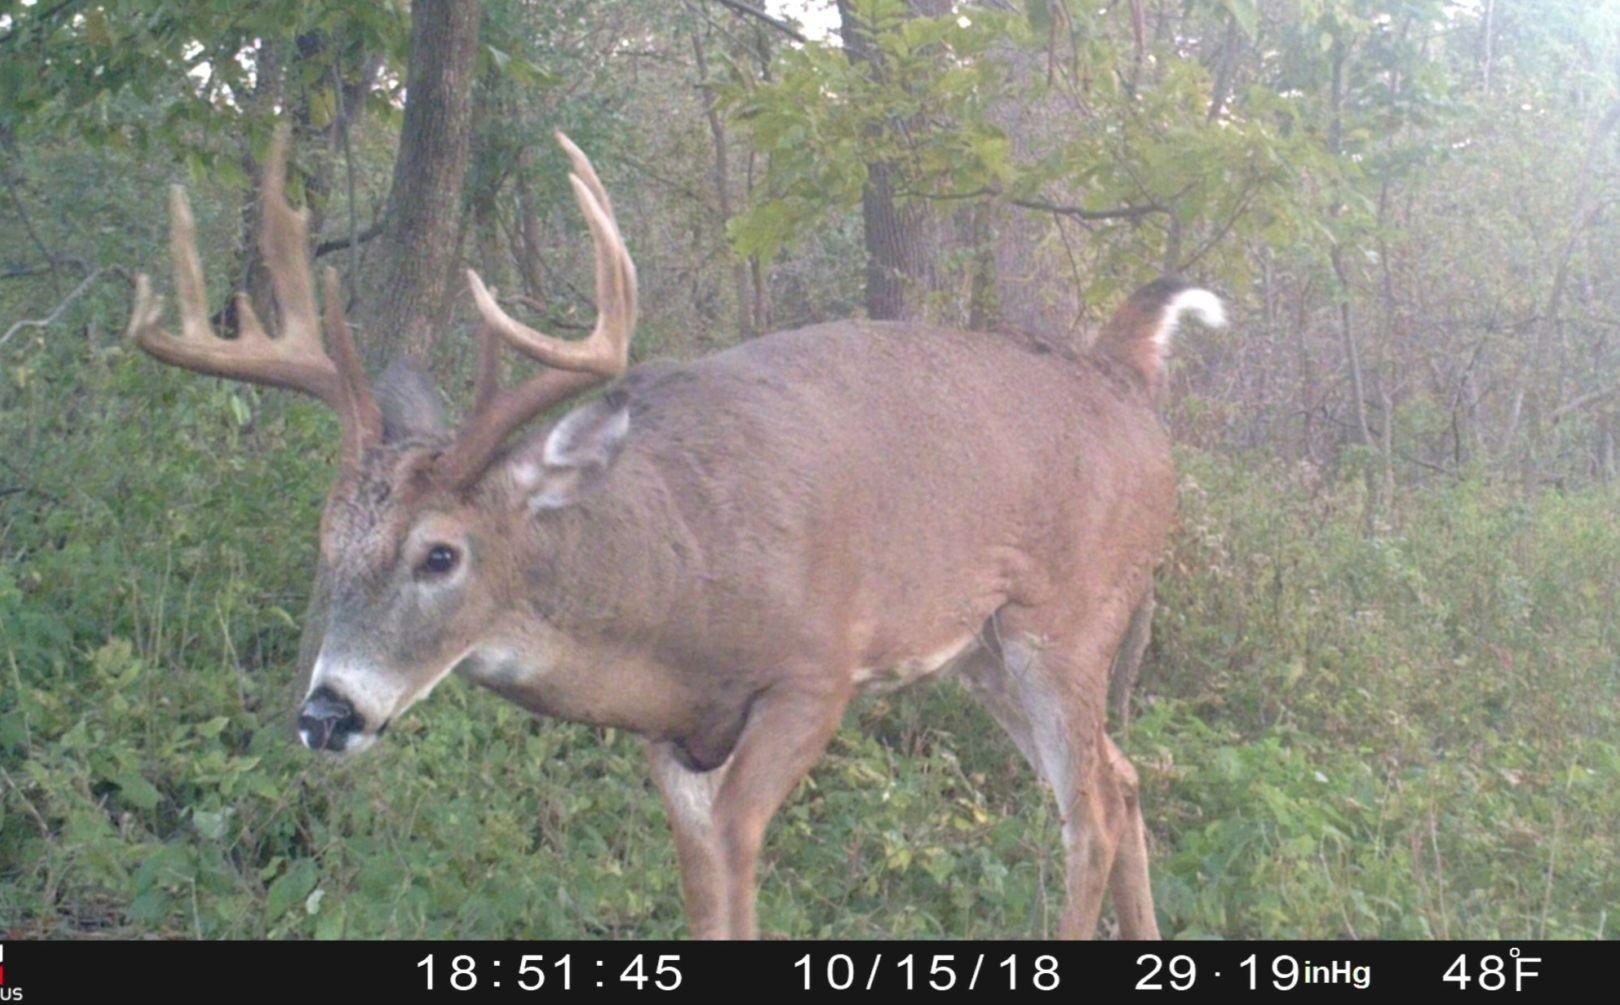 When Will The Whitetail Rut Begin | Whitetail Habitat Solutions  Ohio 2021 Deer Rutt